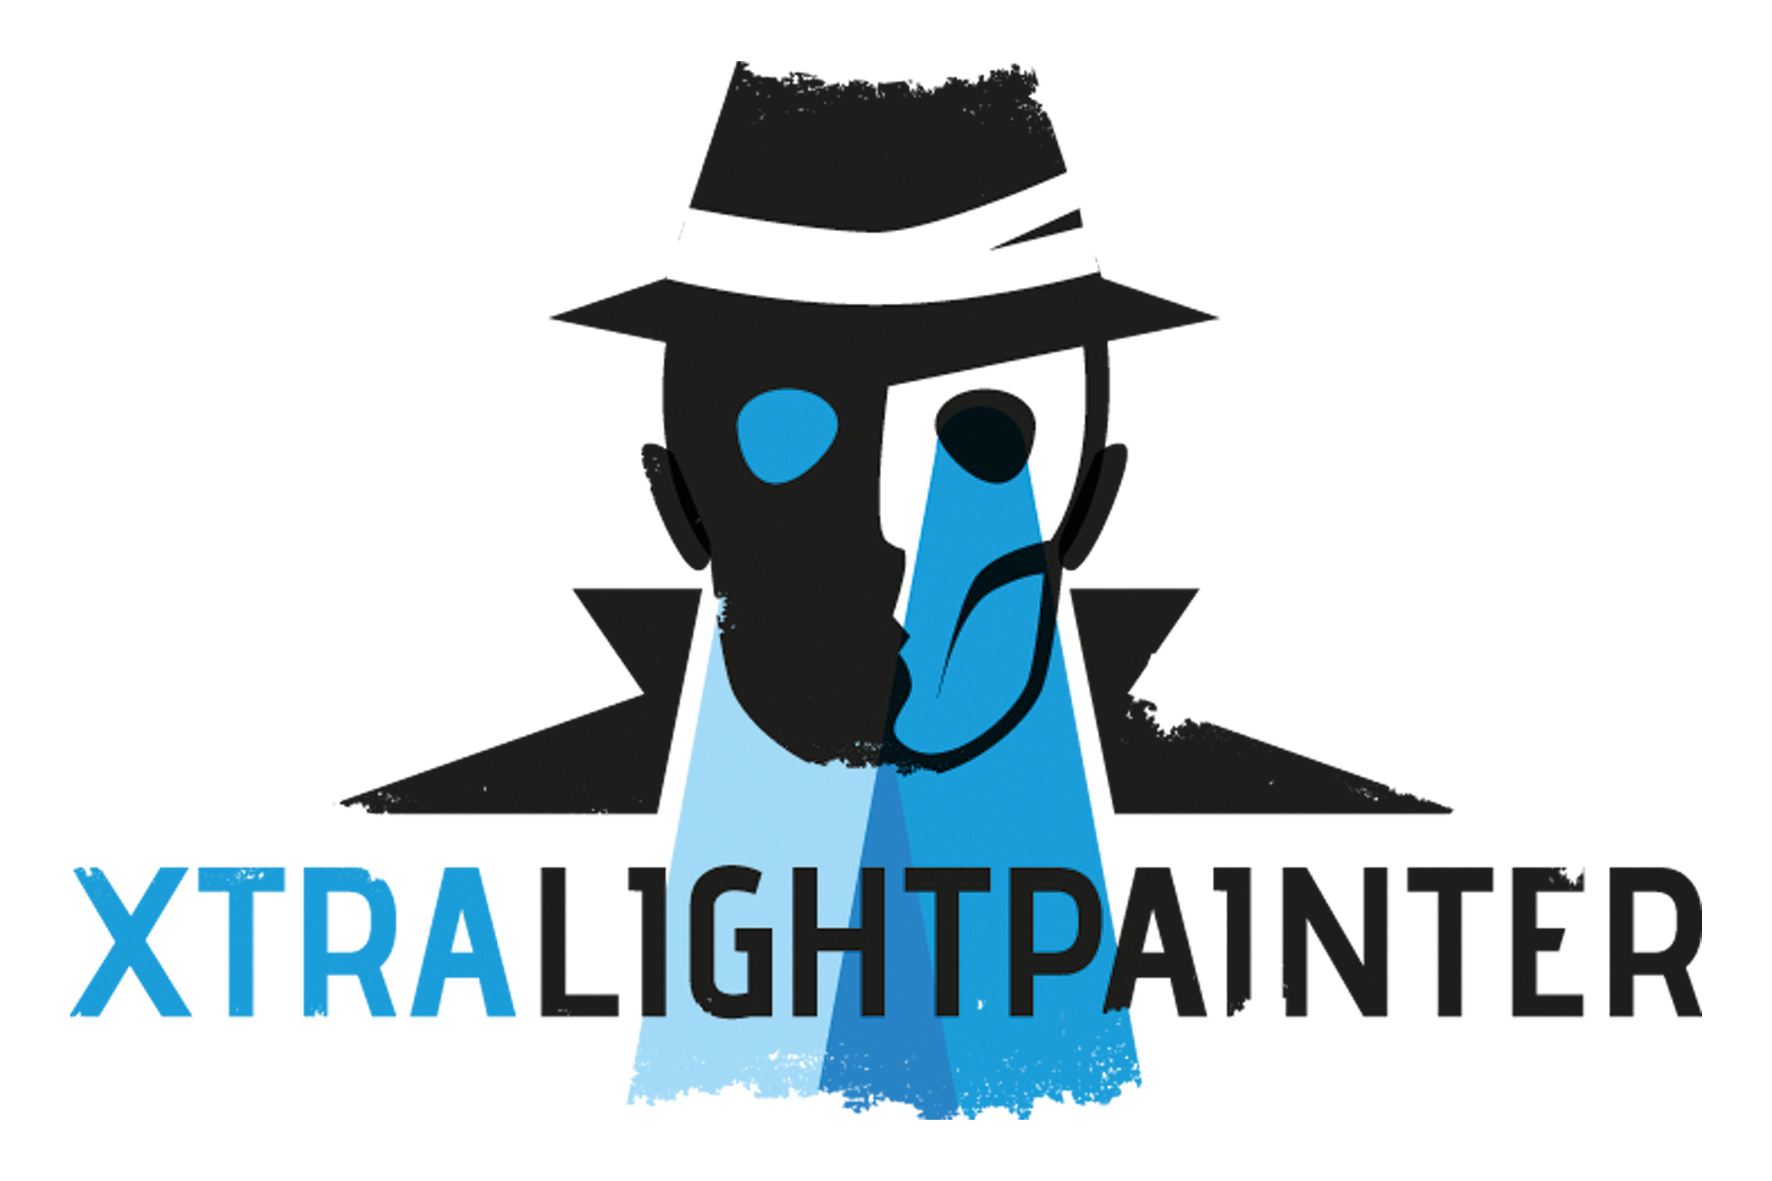 logo xtralightpainter 10x15